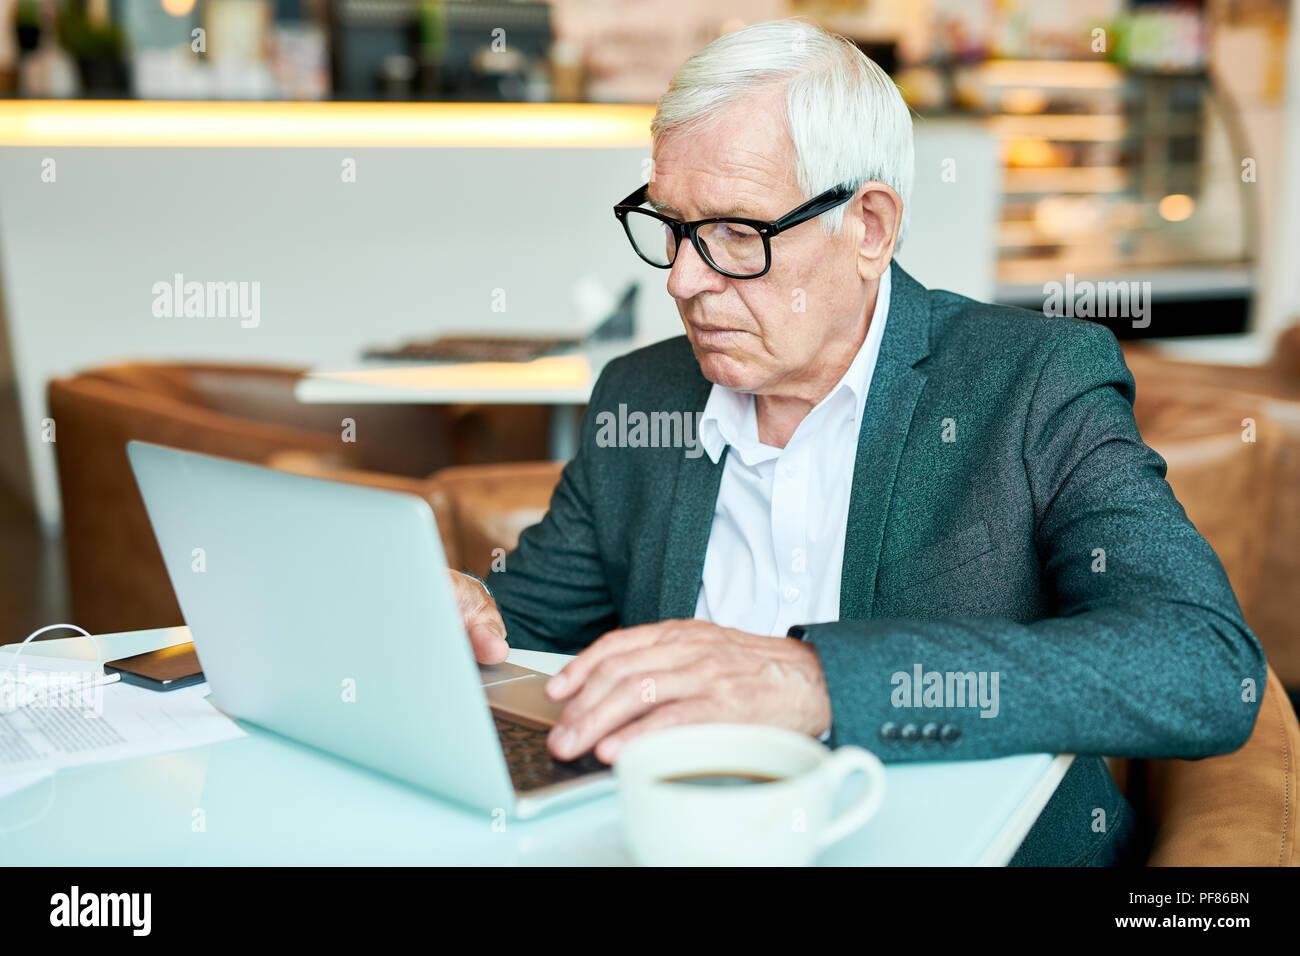 Senior Businessman Using Laptop in Cafe - Stock Image